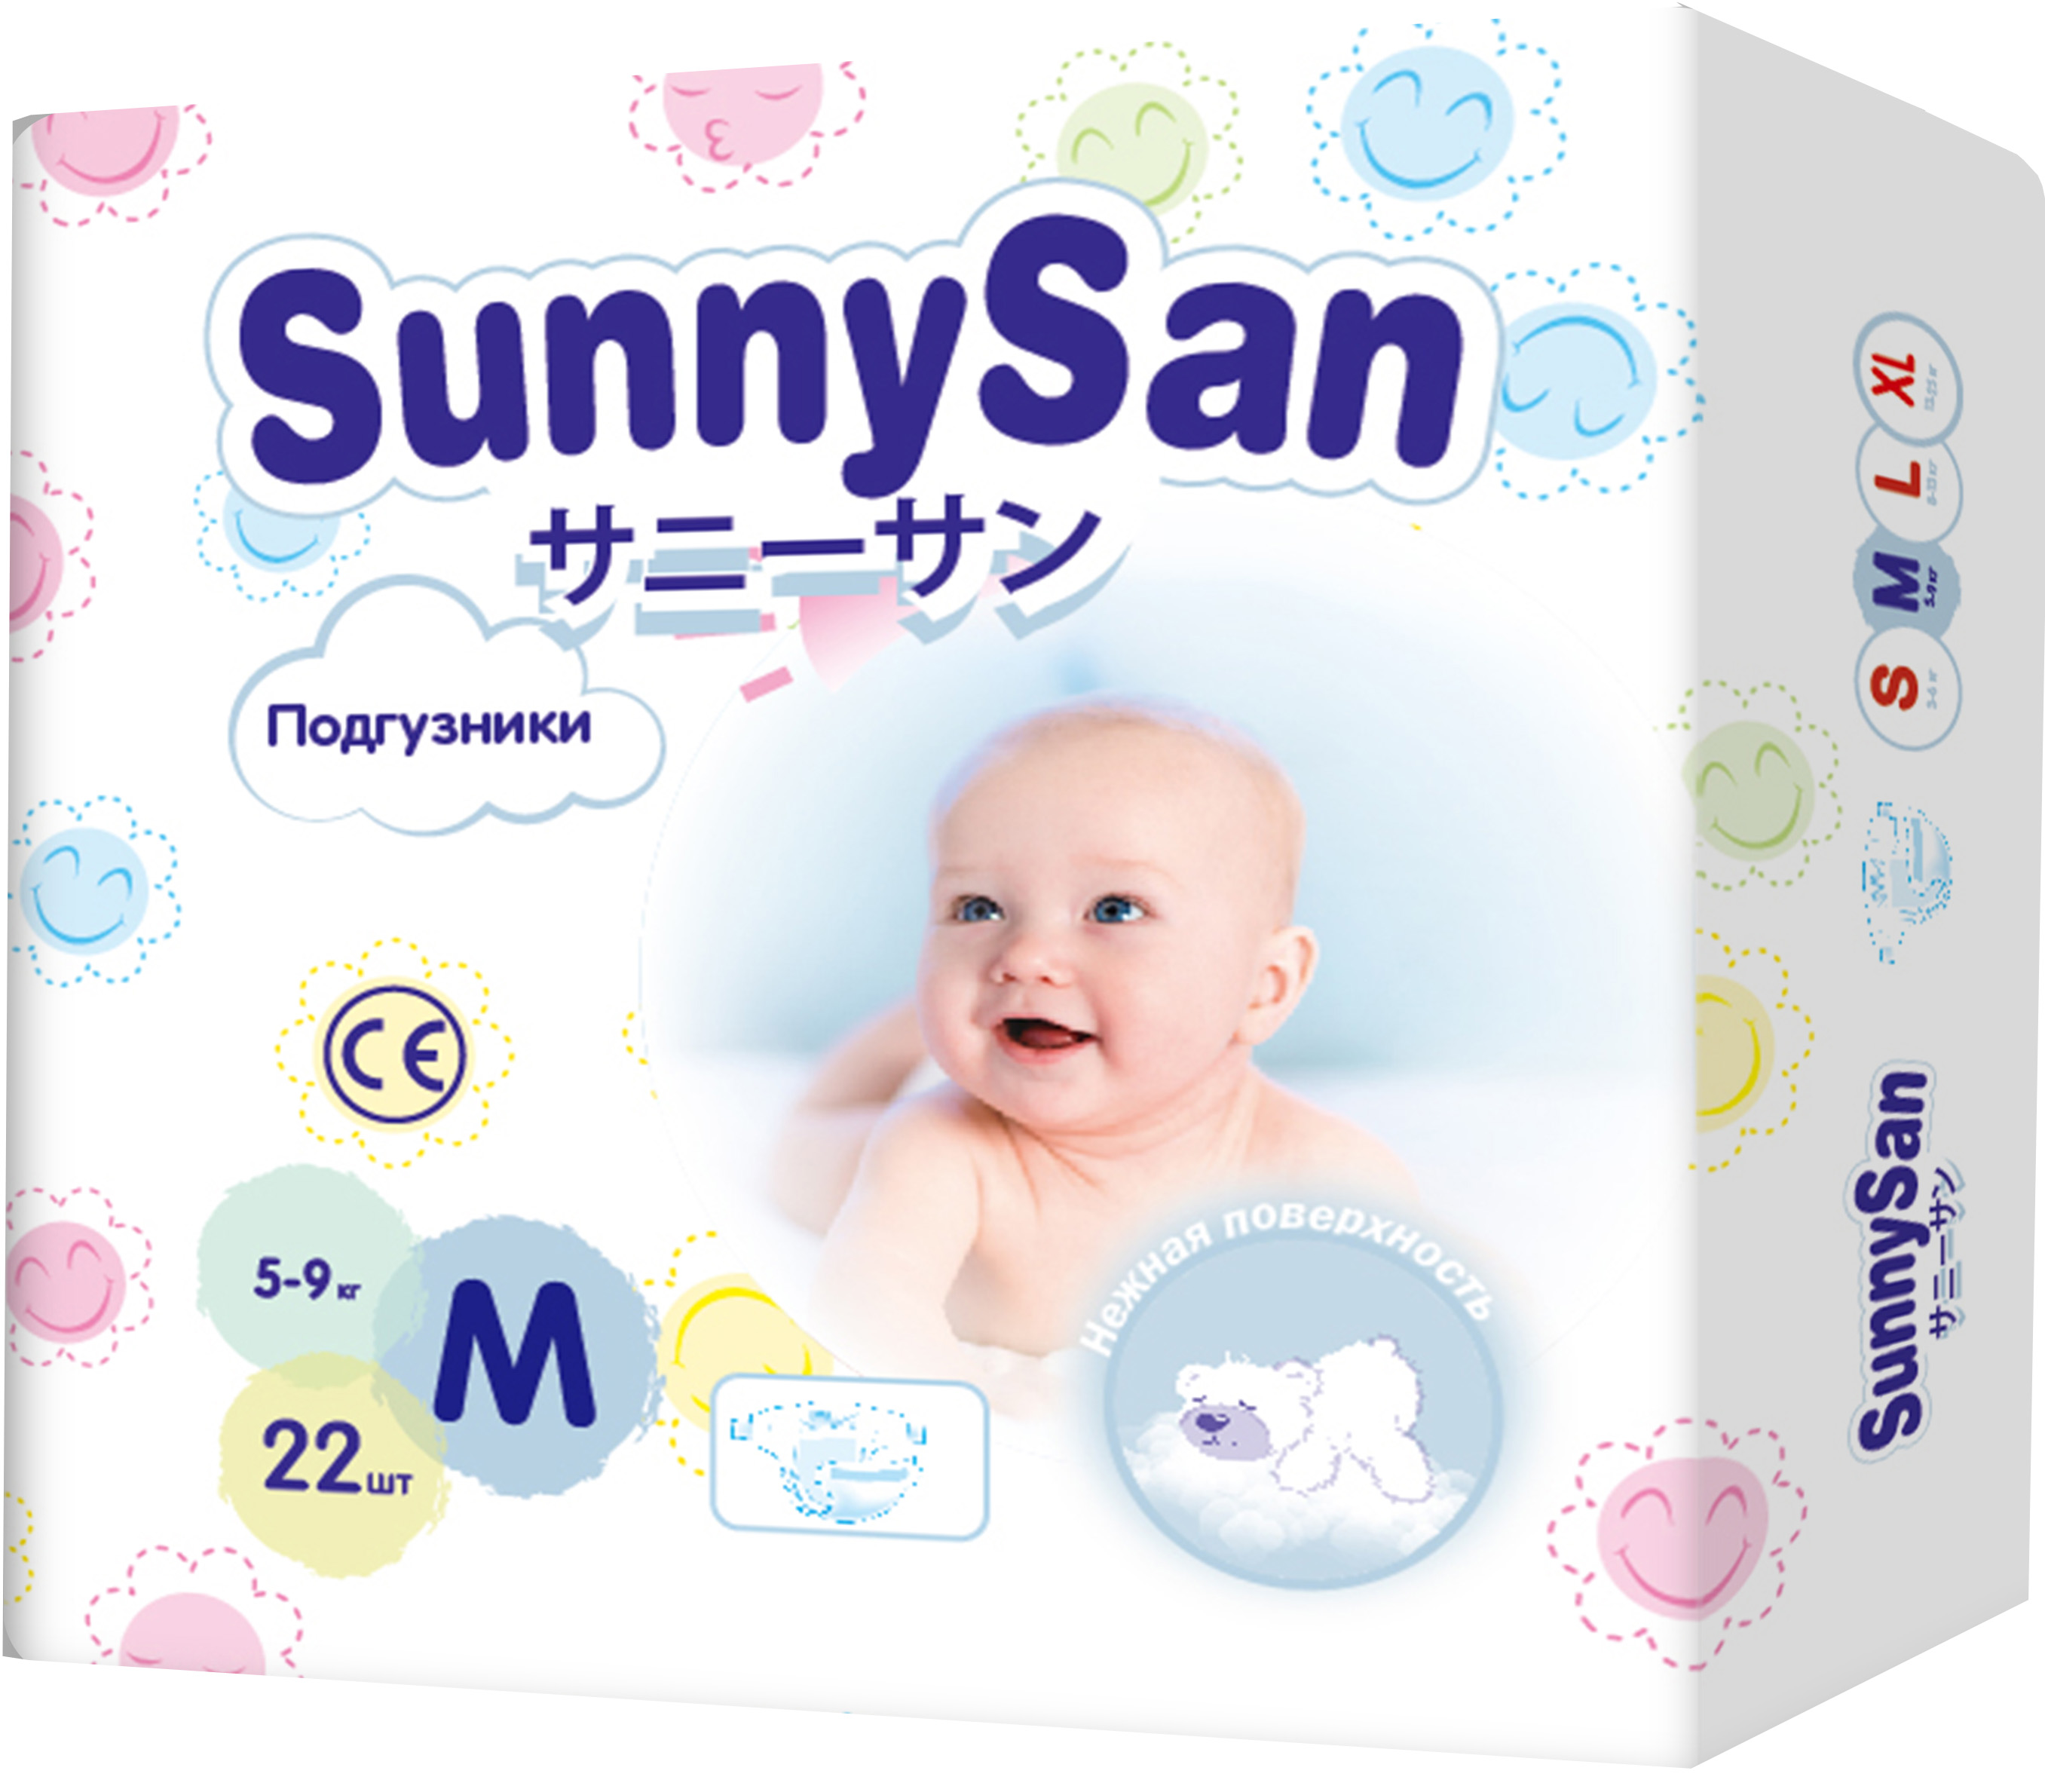 Подгузники SunnySan M (5 - 9 кг) 22 шт.